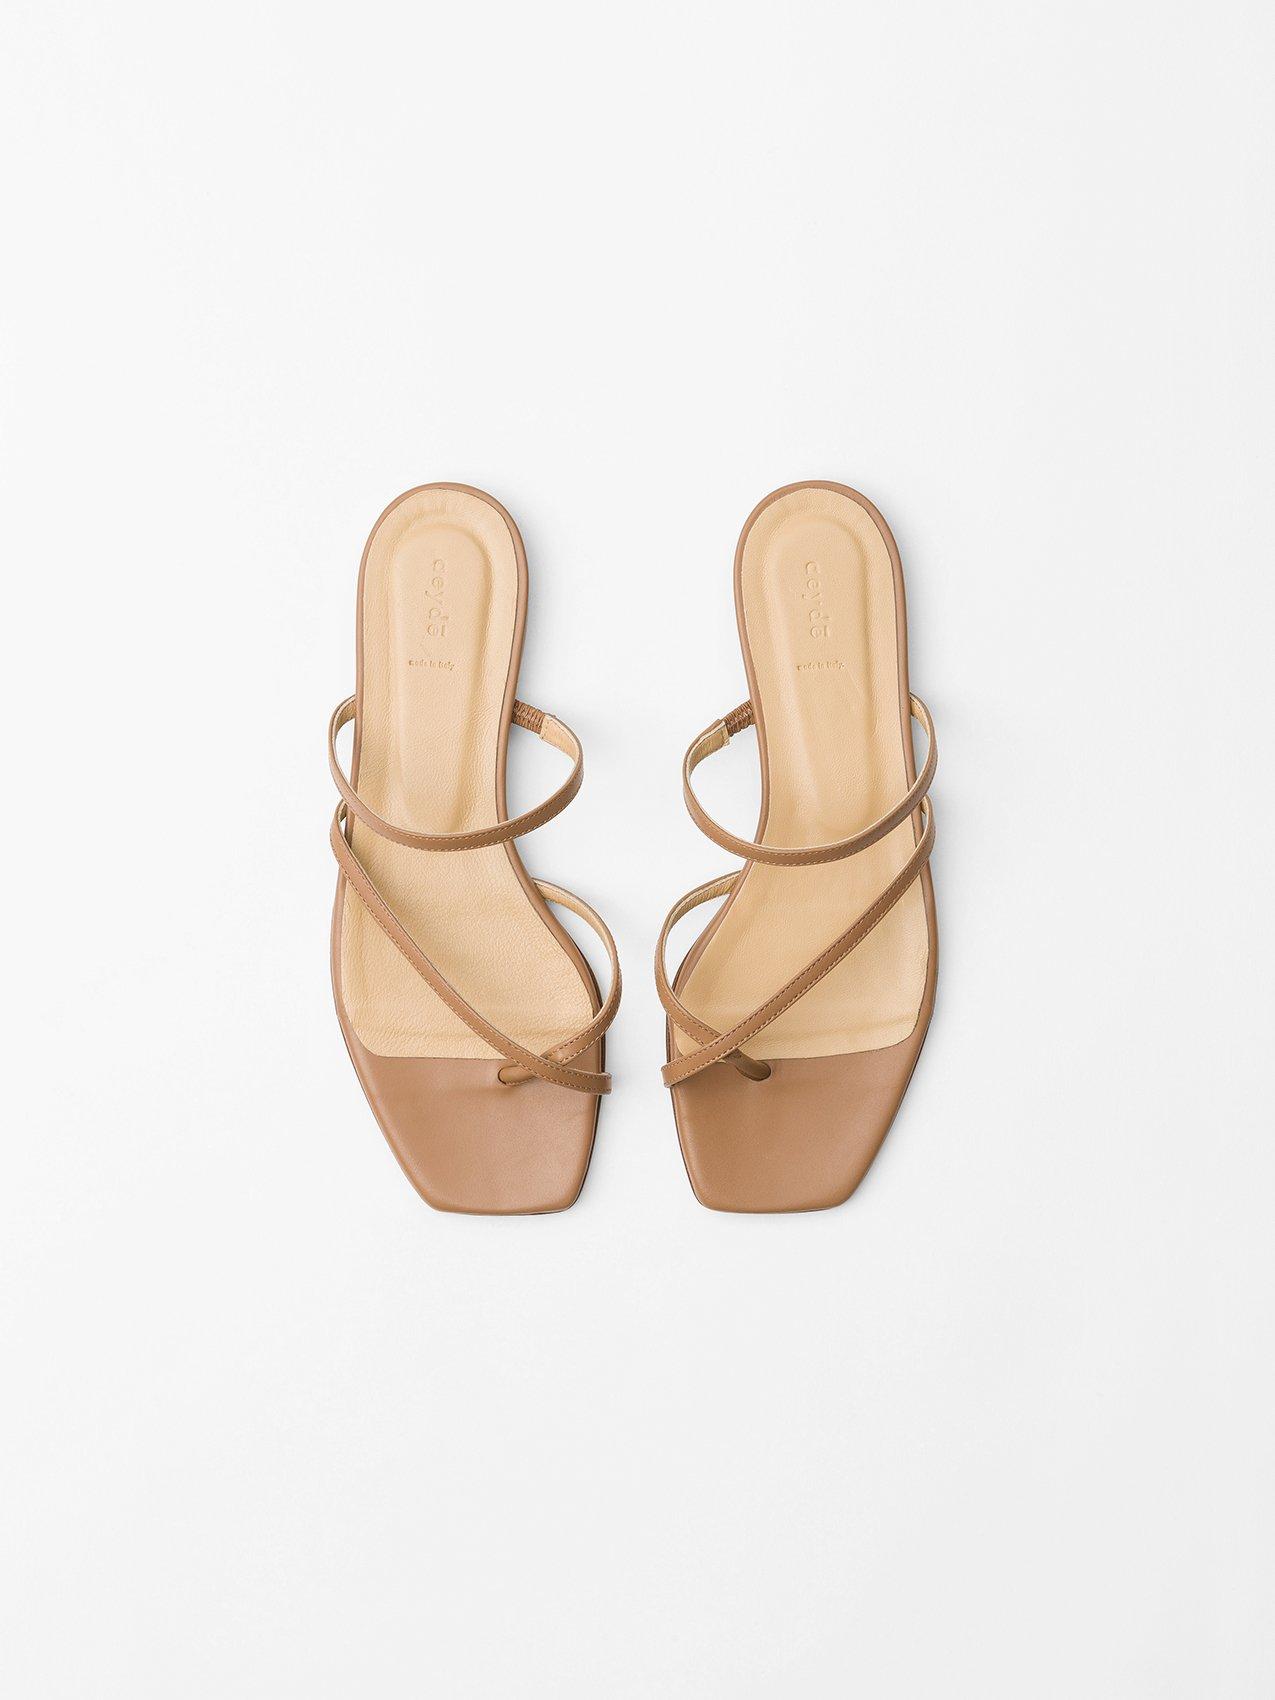 Sandale, Aeyde, Marina, Naked Sandals